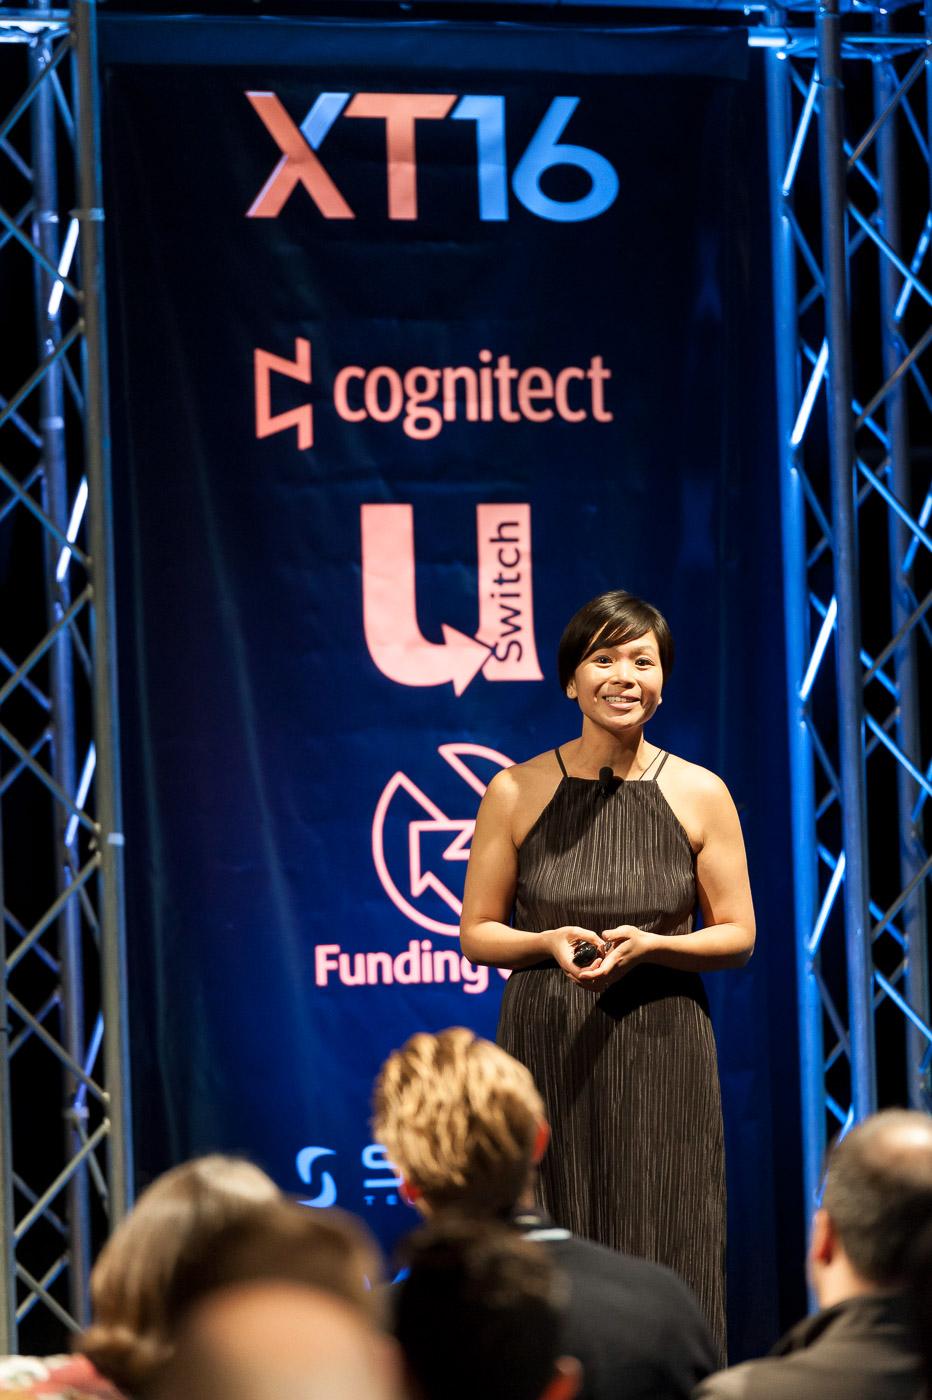 Talk by Portia Tung at XT16